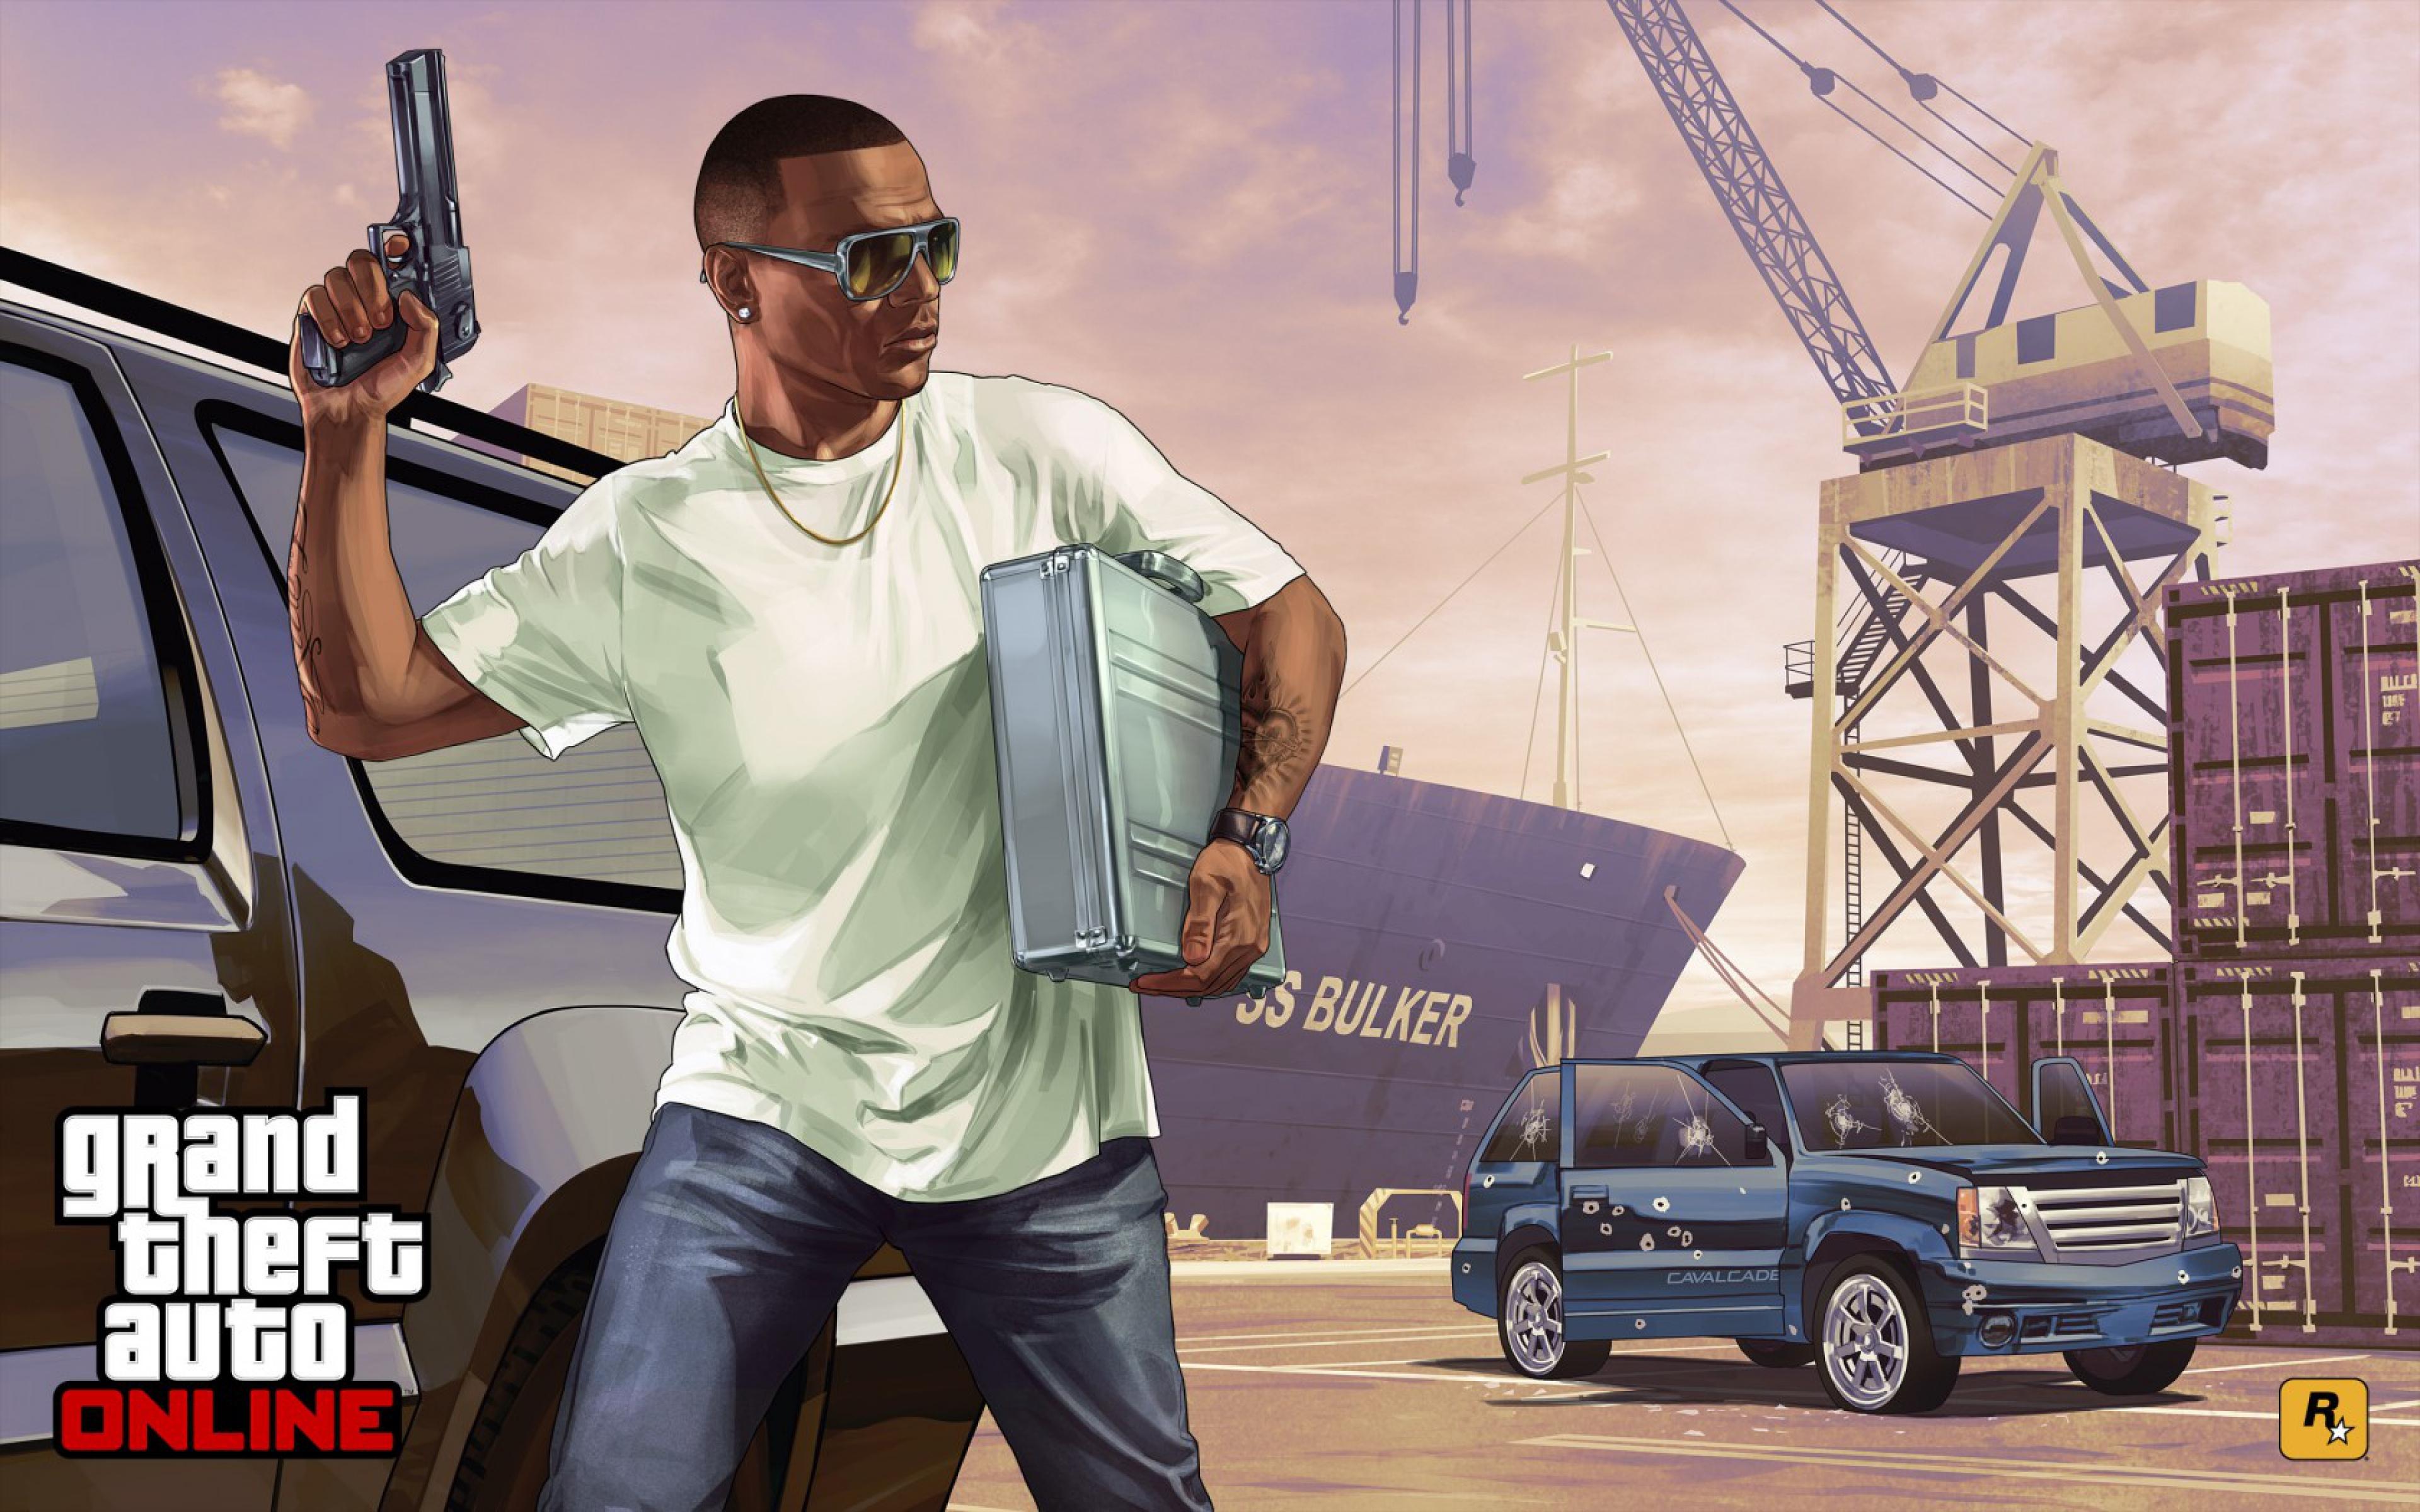 Grand Theft Auto Online Screenshots